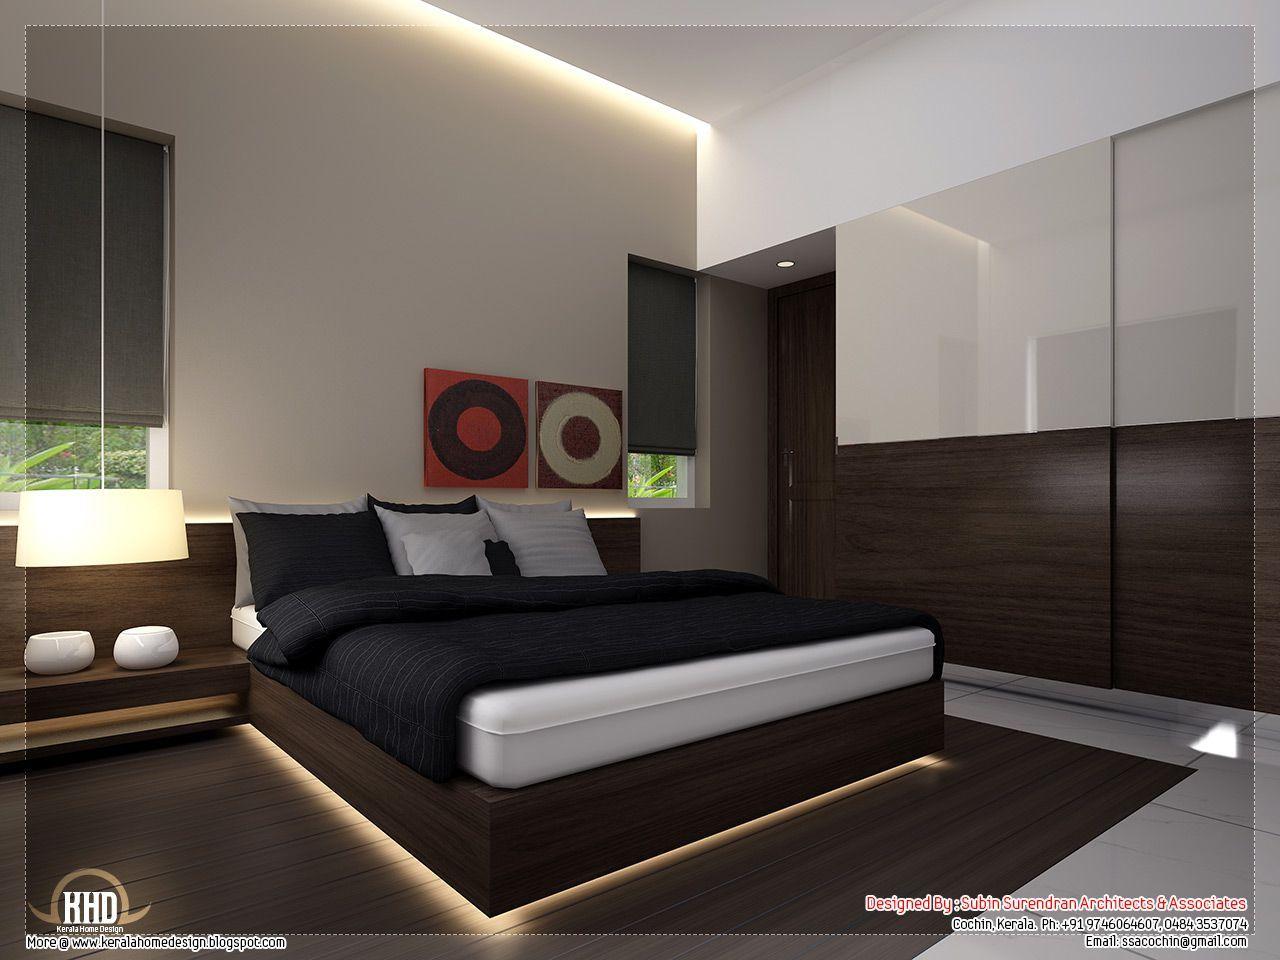 Interior design photos for home india - Home Interior Design India Gandum